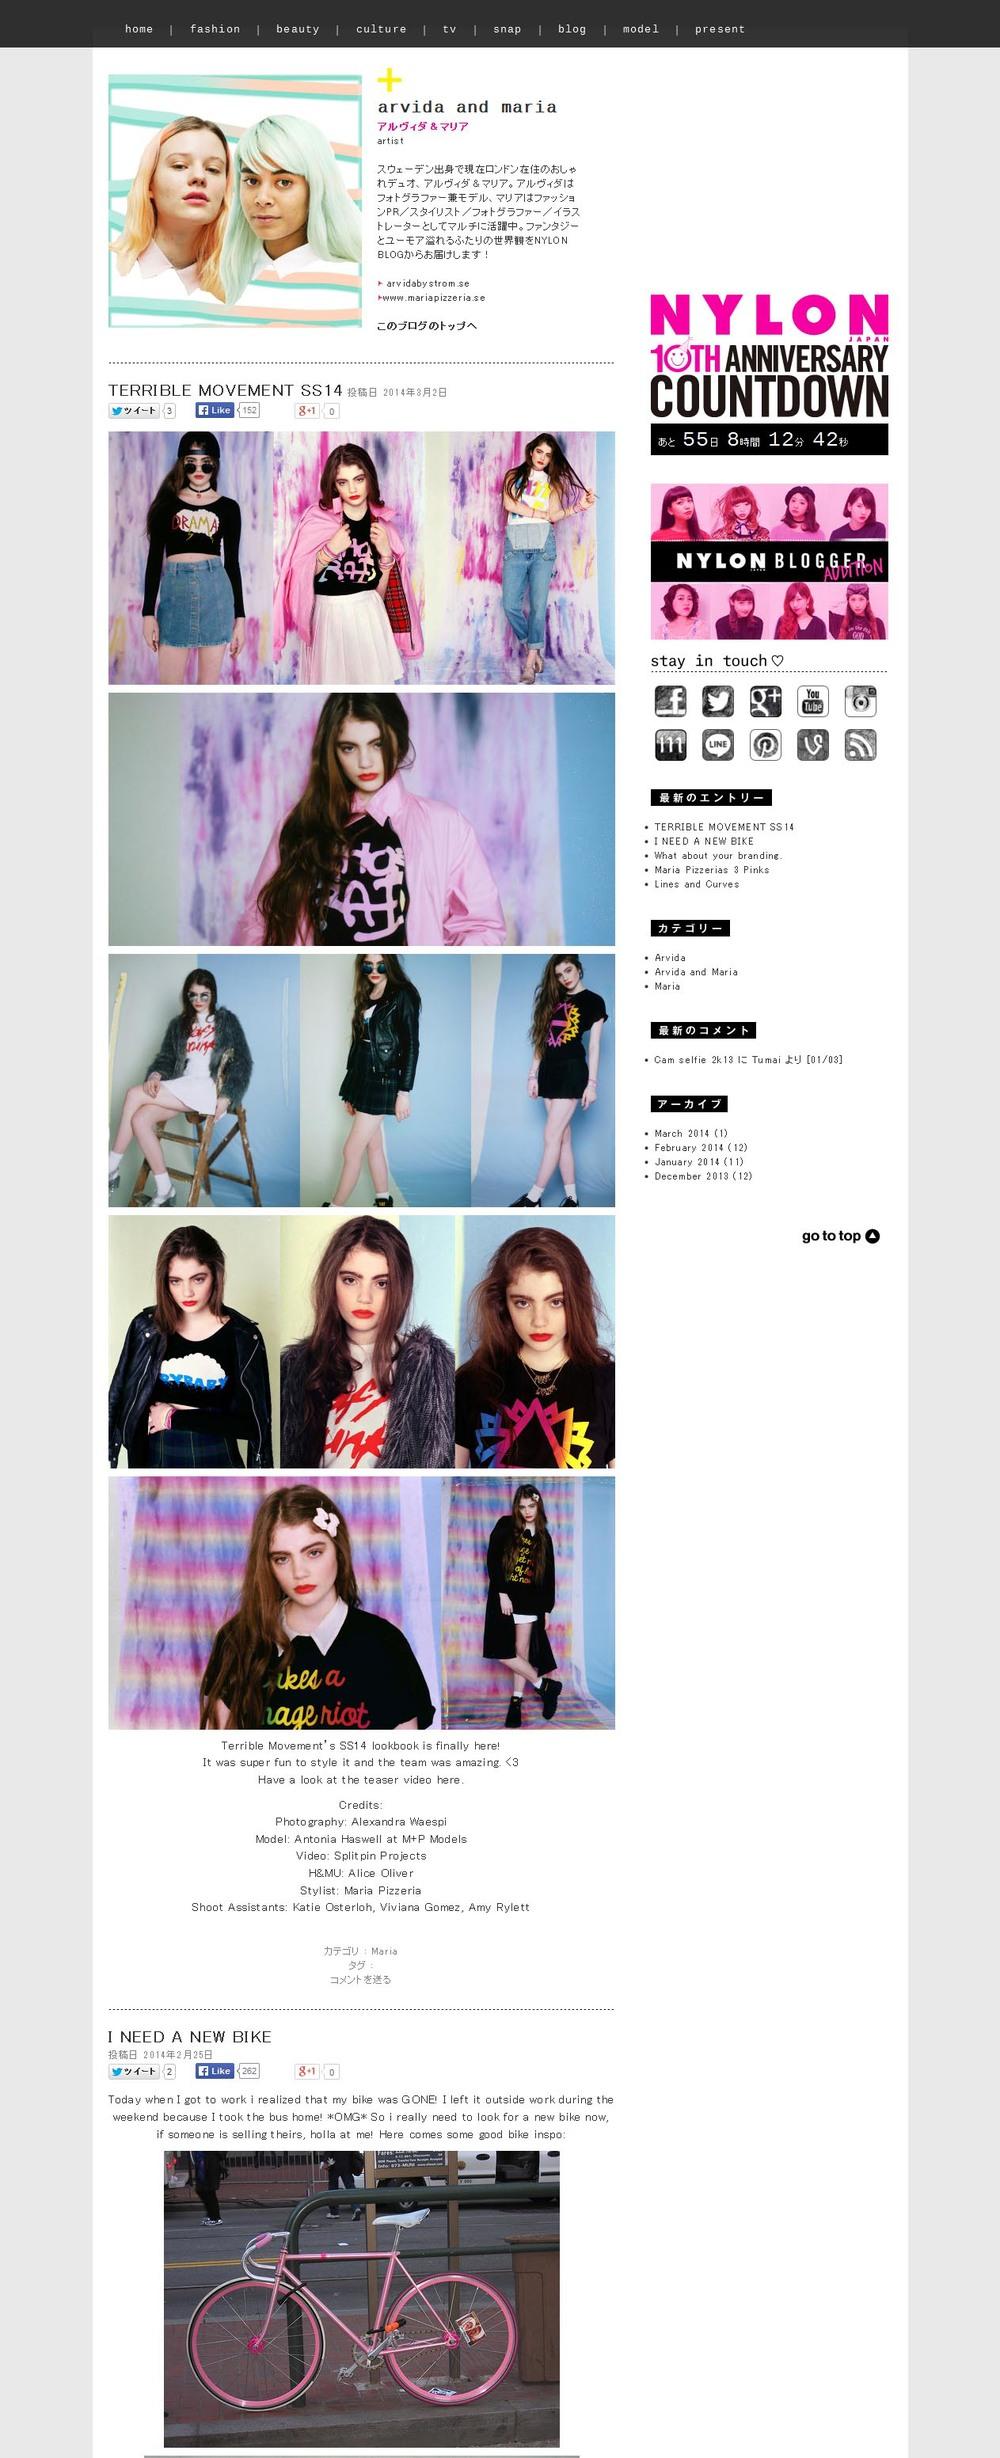 Nylon_jp, 02-03-14, Home page.jpg